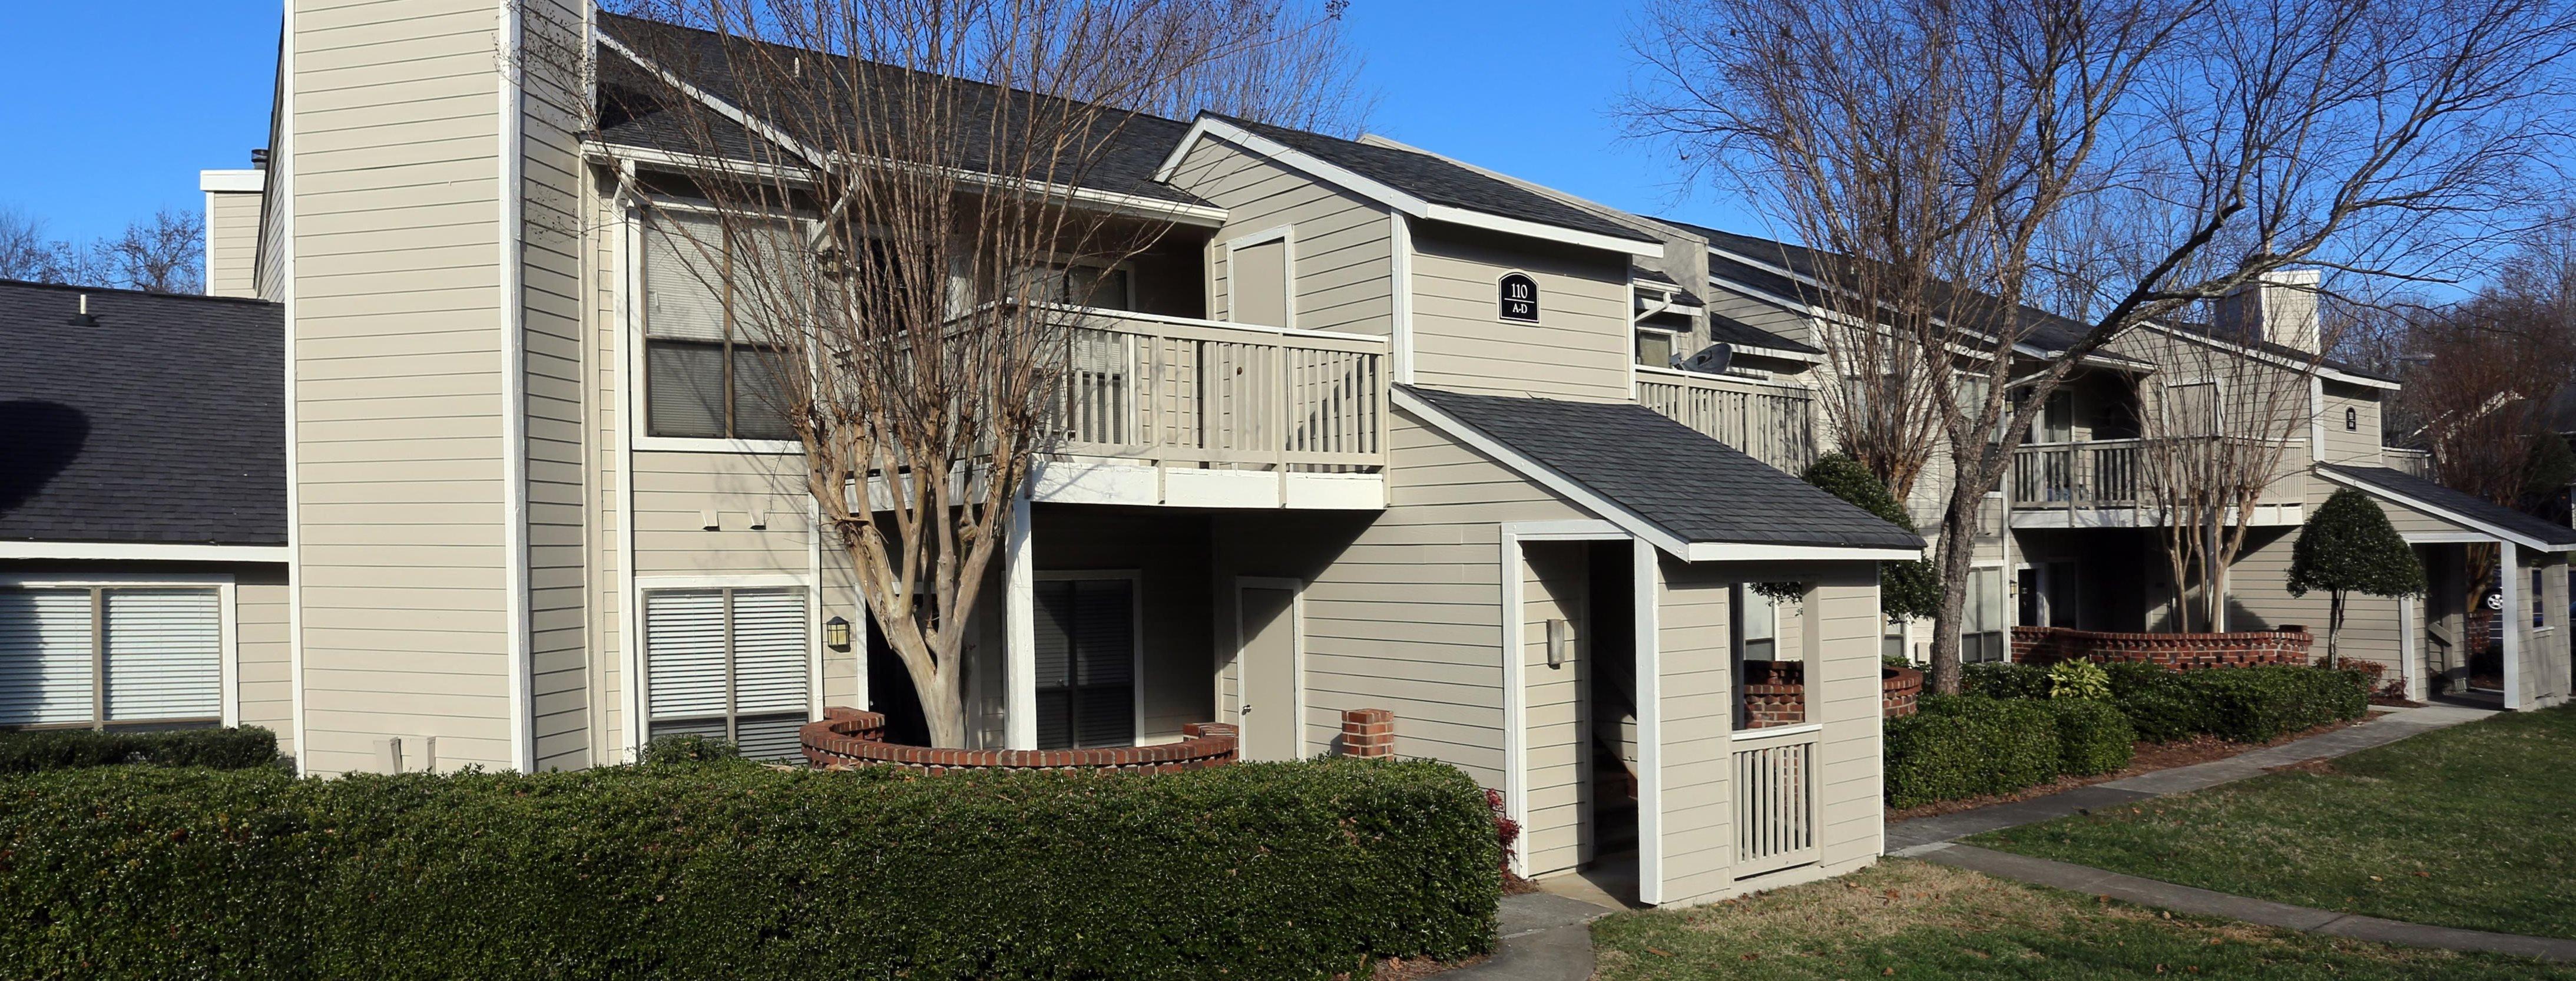 Sedgefield Apartments Apartments In Winston Salem Nc